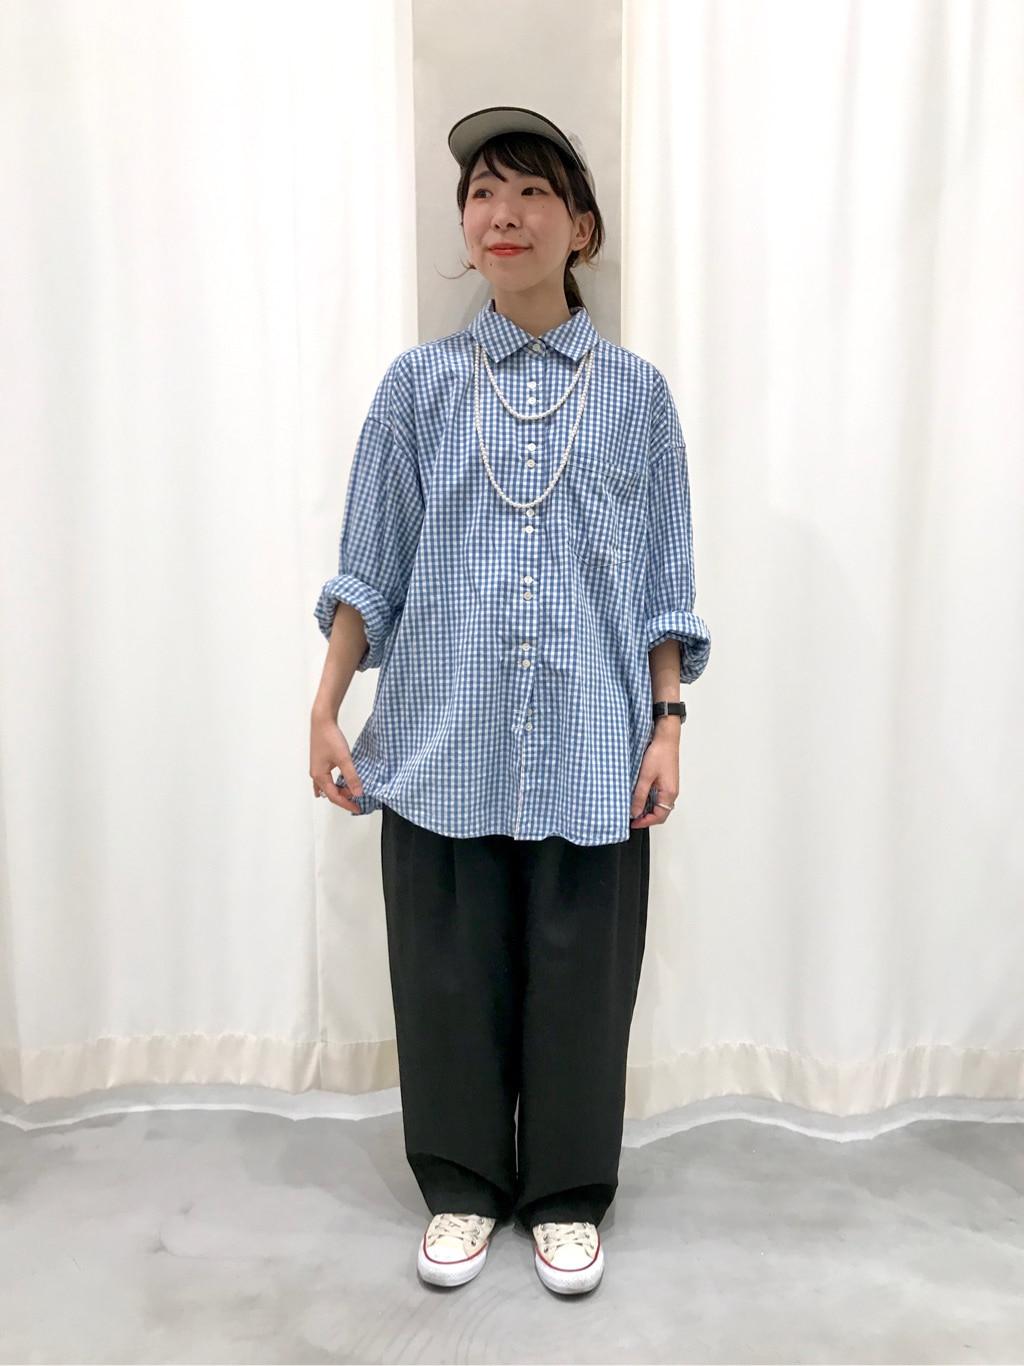 - PAR ICI CHILD WOMAN , PAR ICI 東京スカイツリータウン・ソラマチ 身長:154cm 2020.08.18